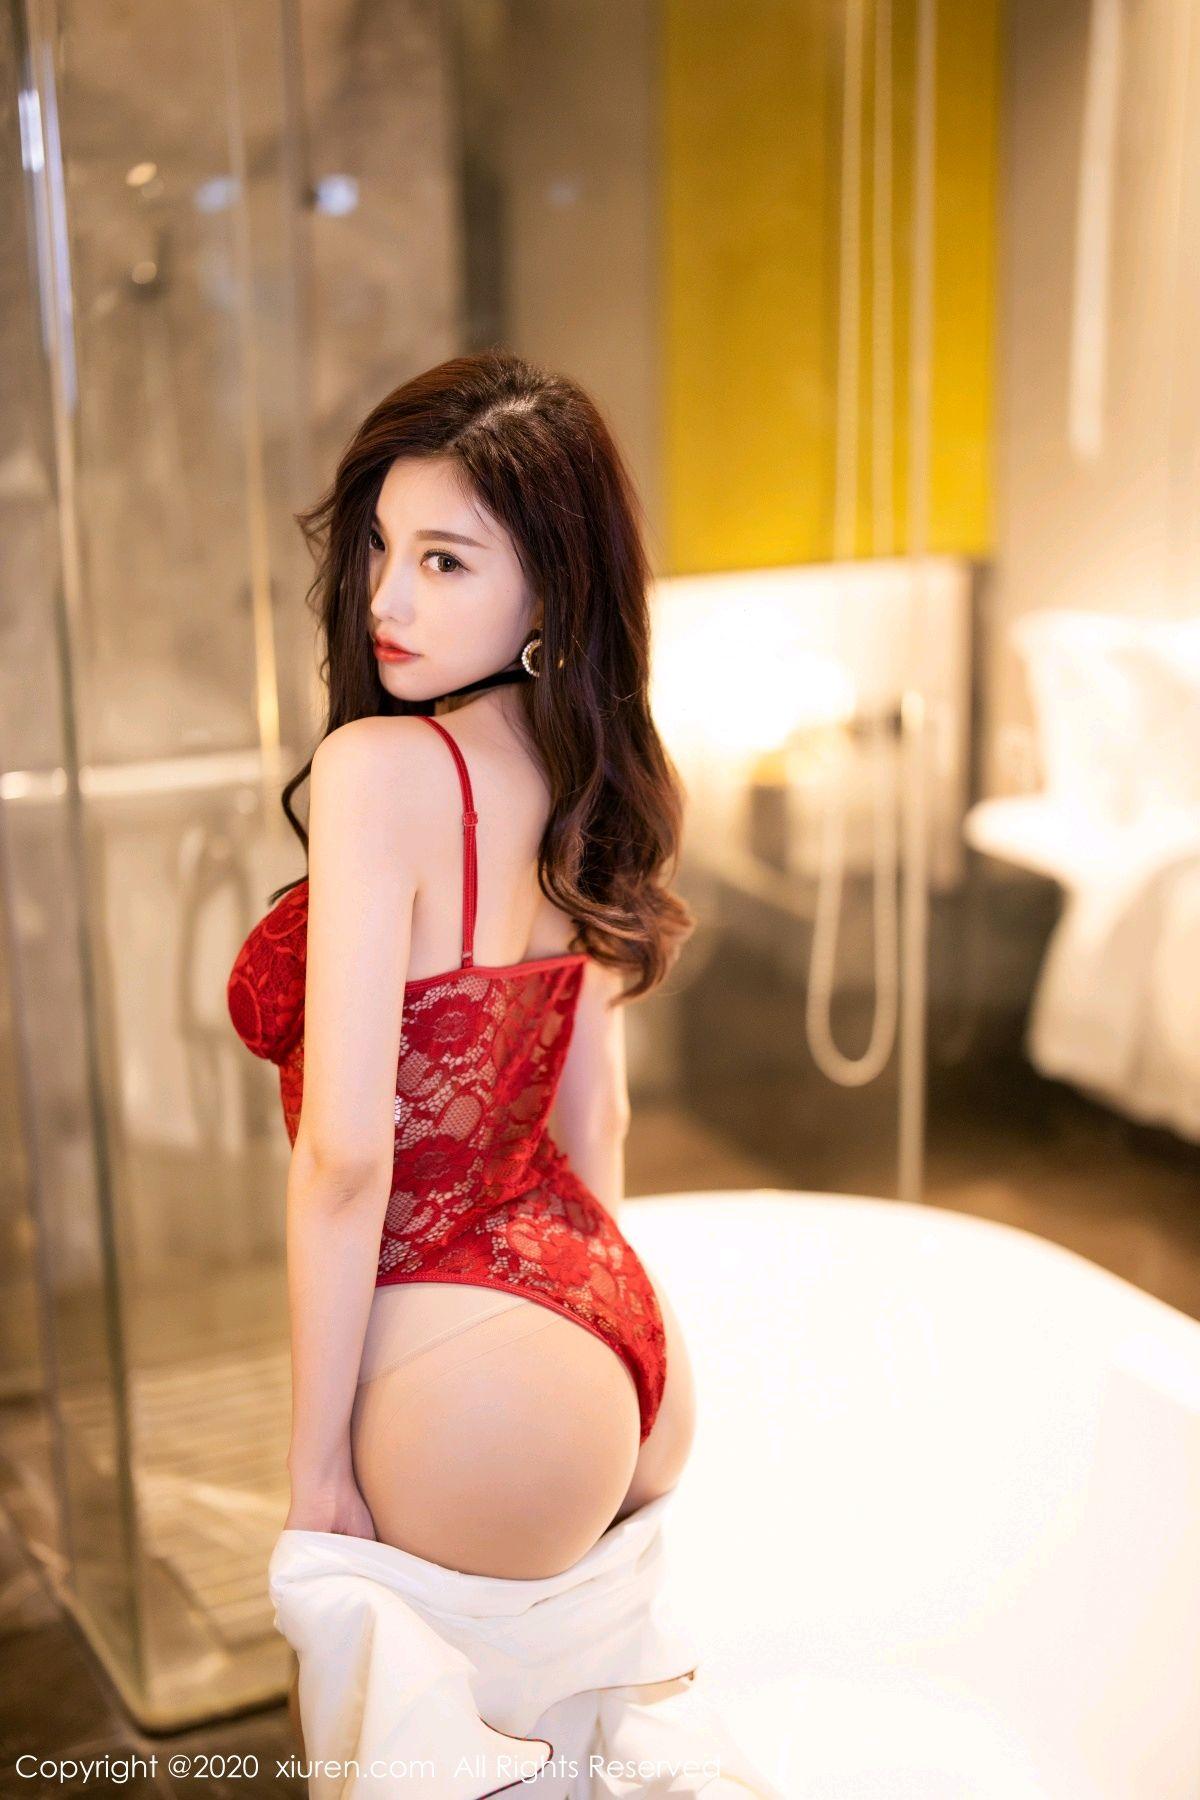 [XiuRen] Vol.2671 Yang Chen Chen 81P, Underwear, Xiuren, Yang Chen Chen